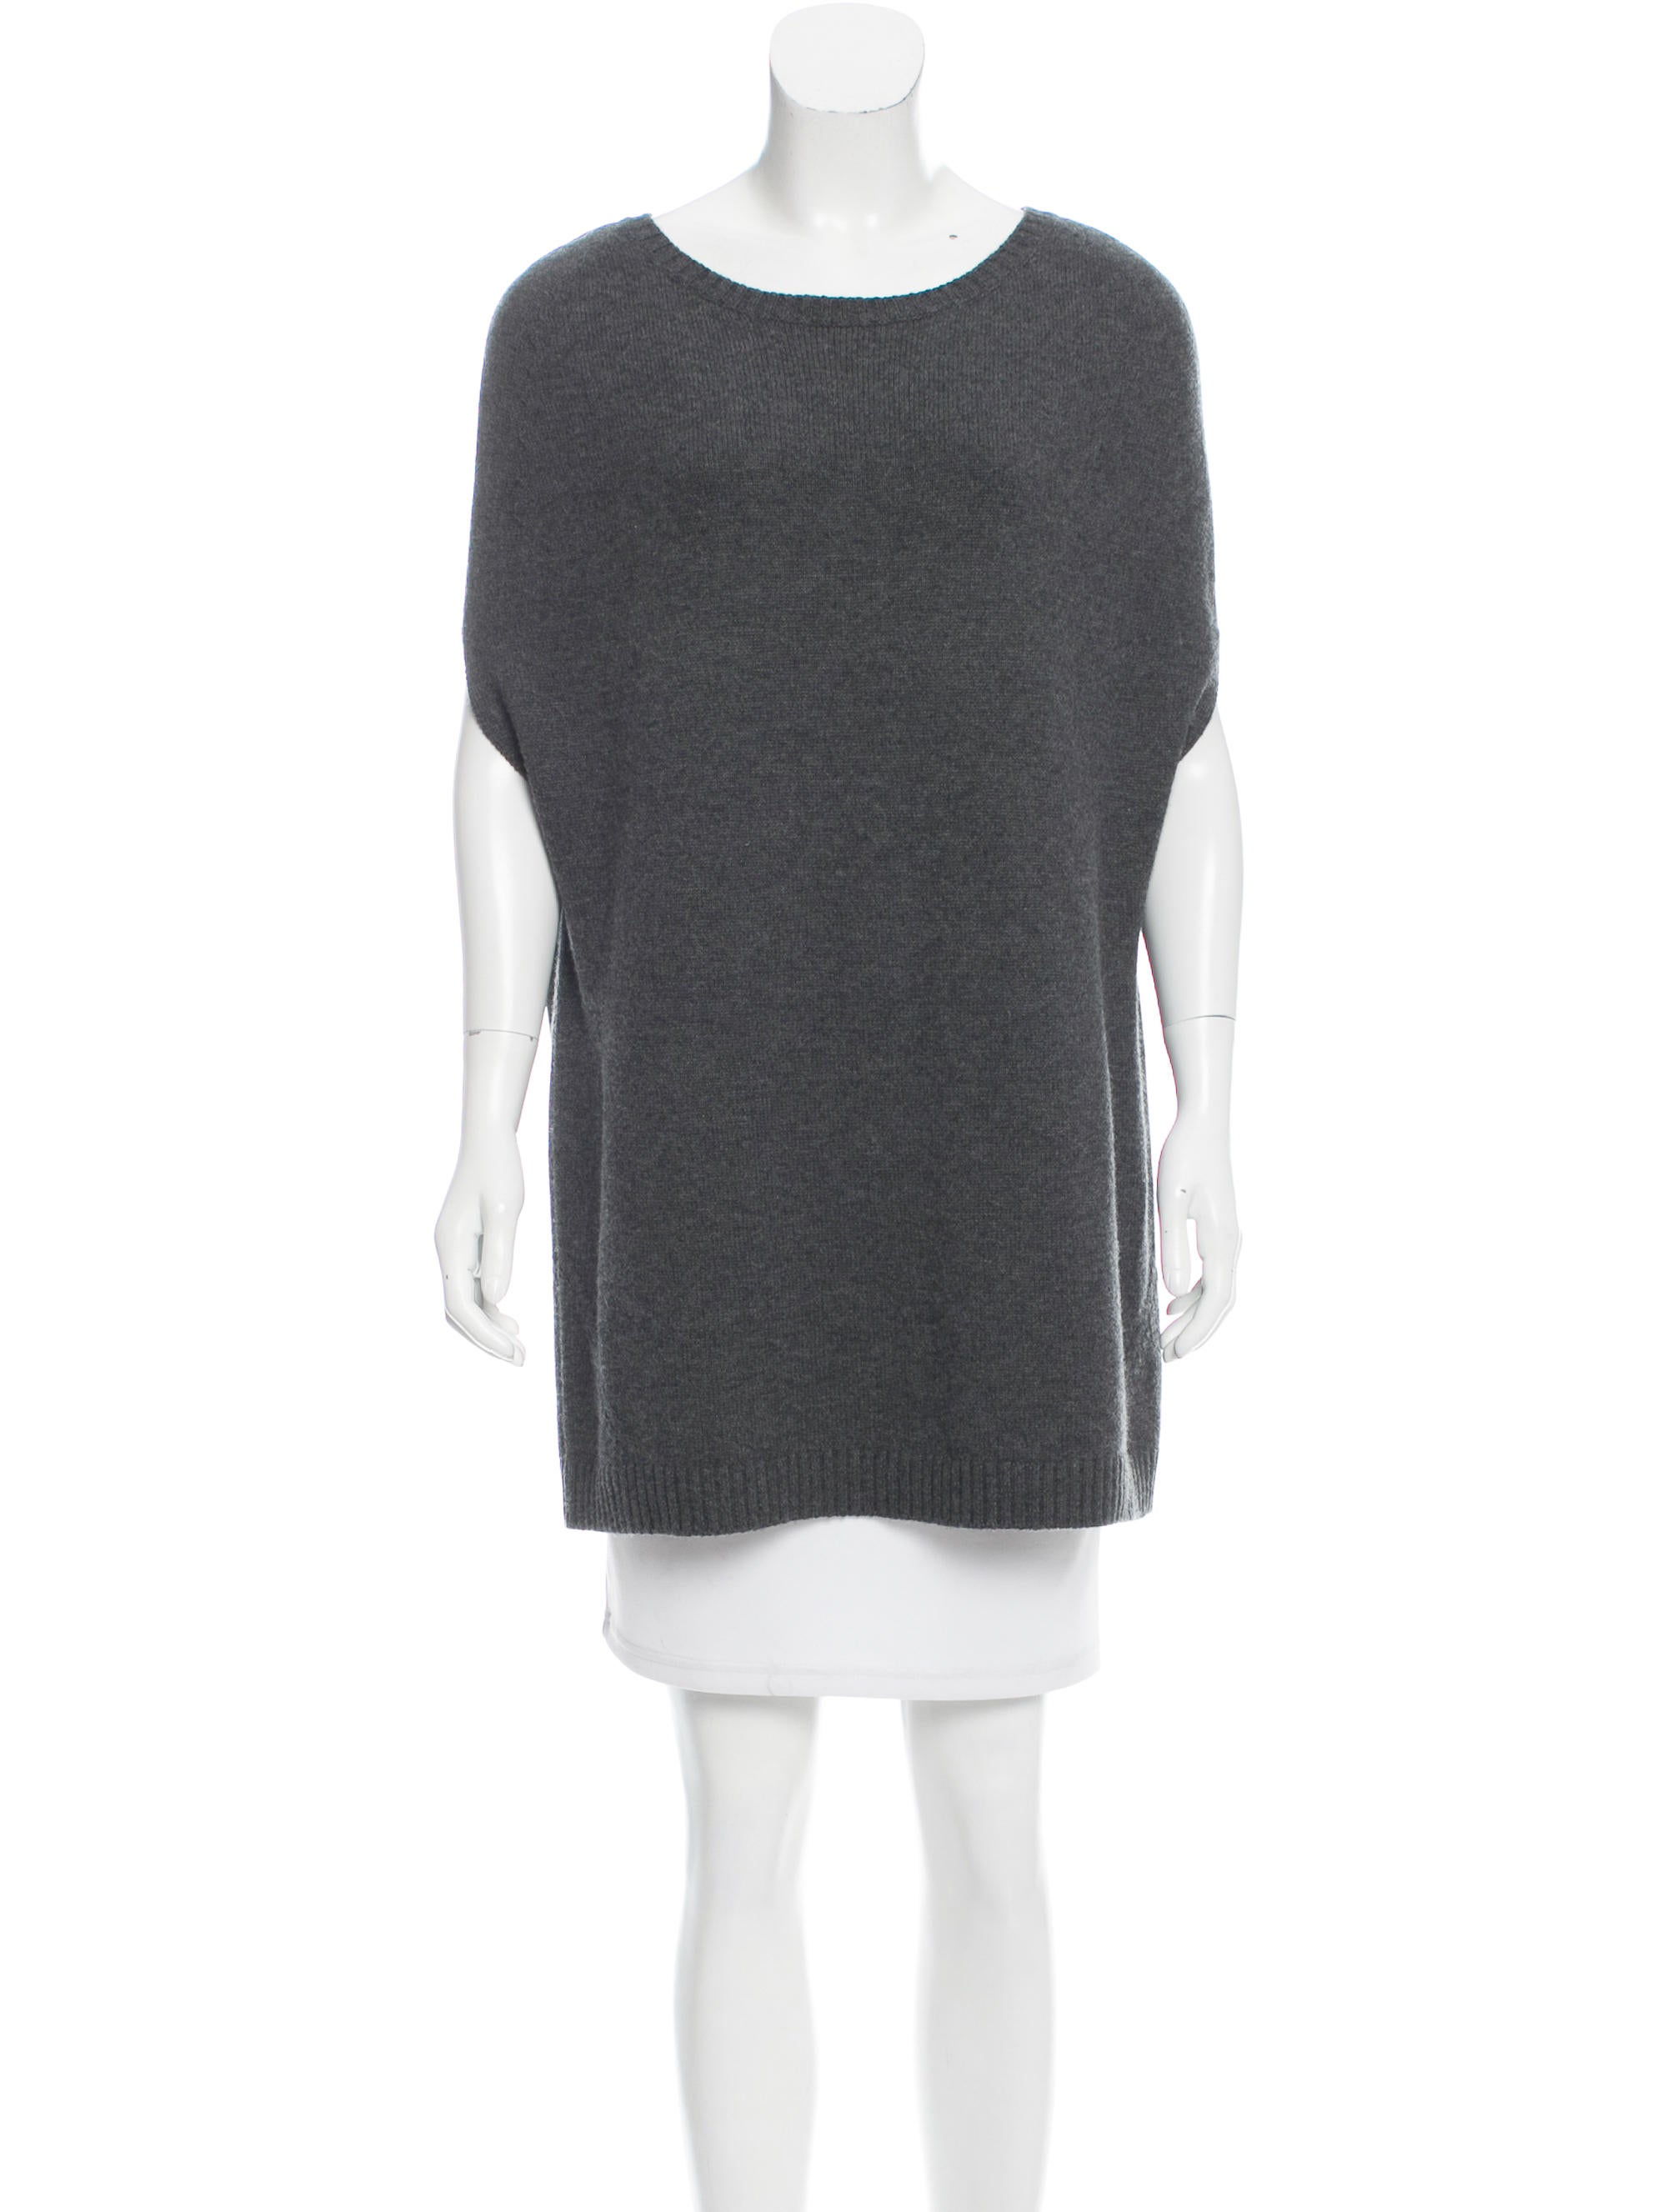 Wool Cape Knitting Pattern : Maje Wool Knit Cape - Clothing - W2M25649 The RealReal